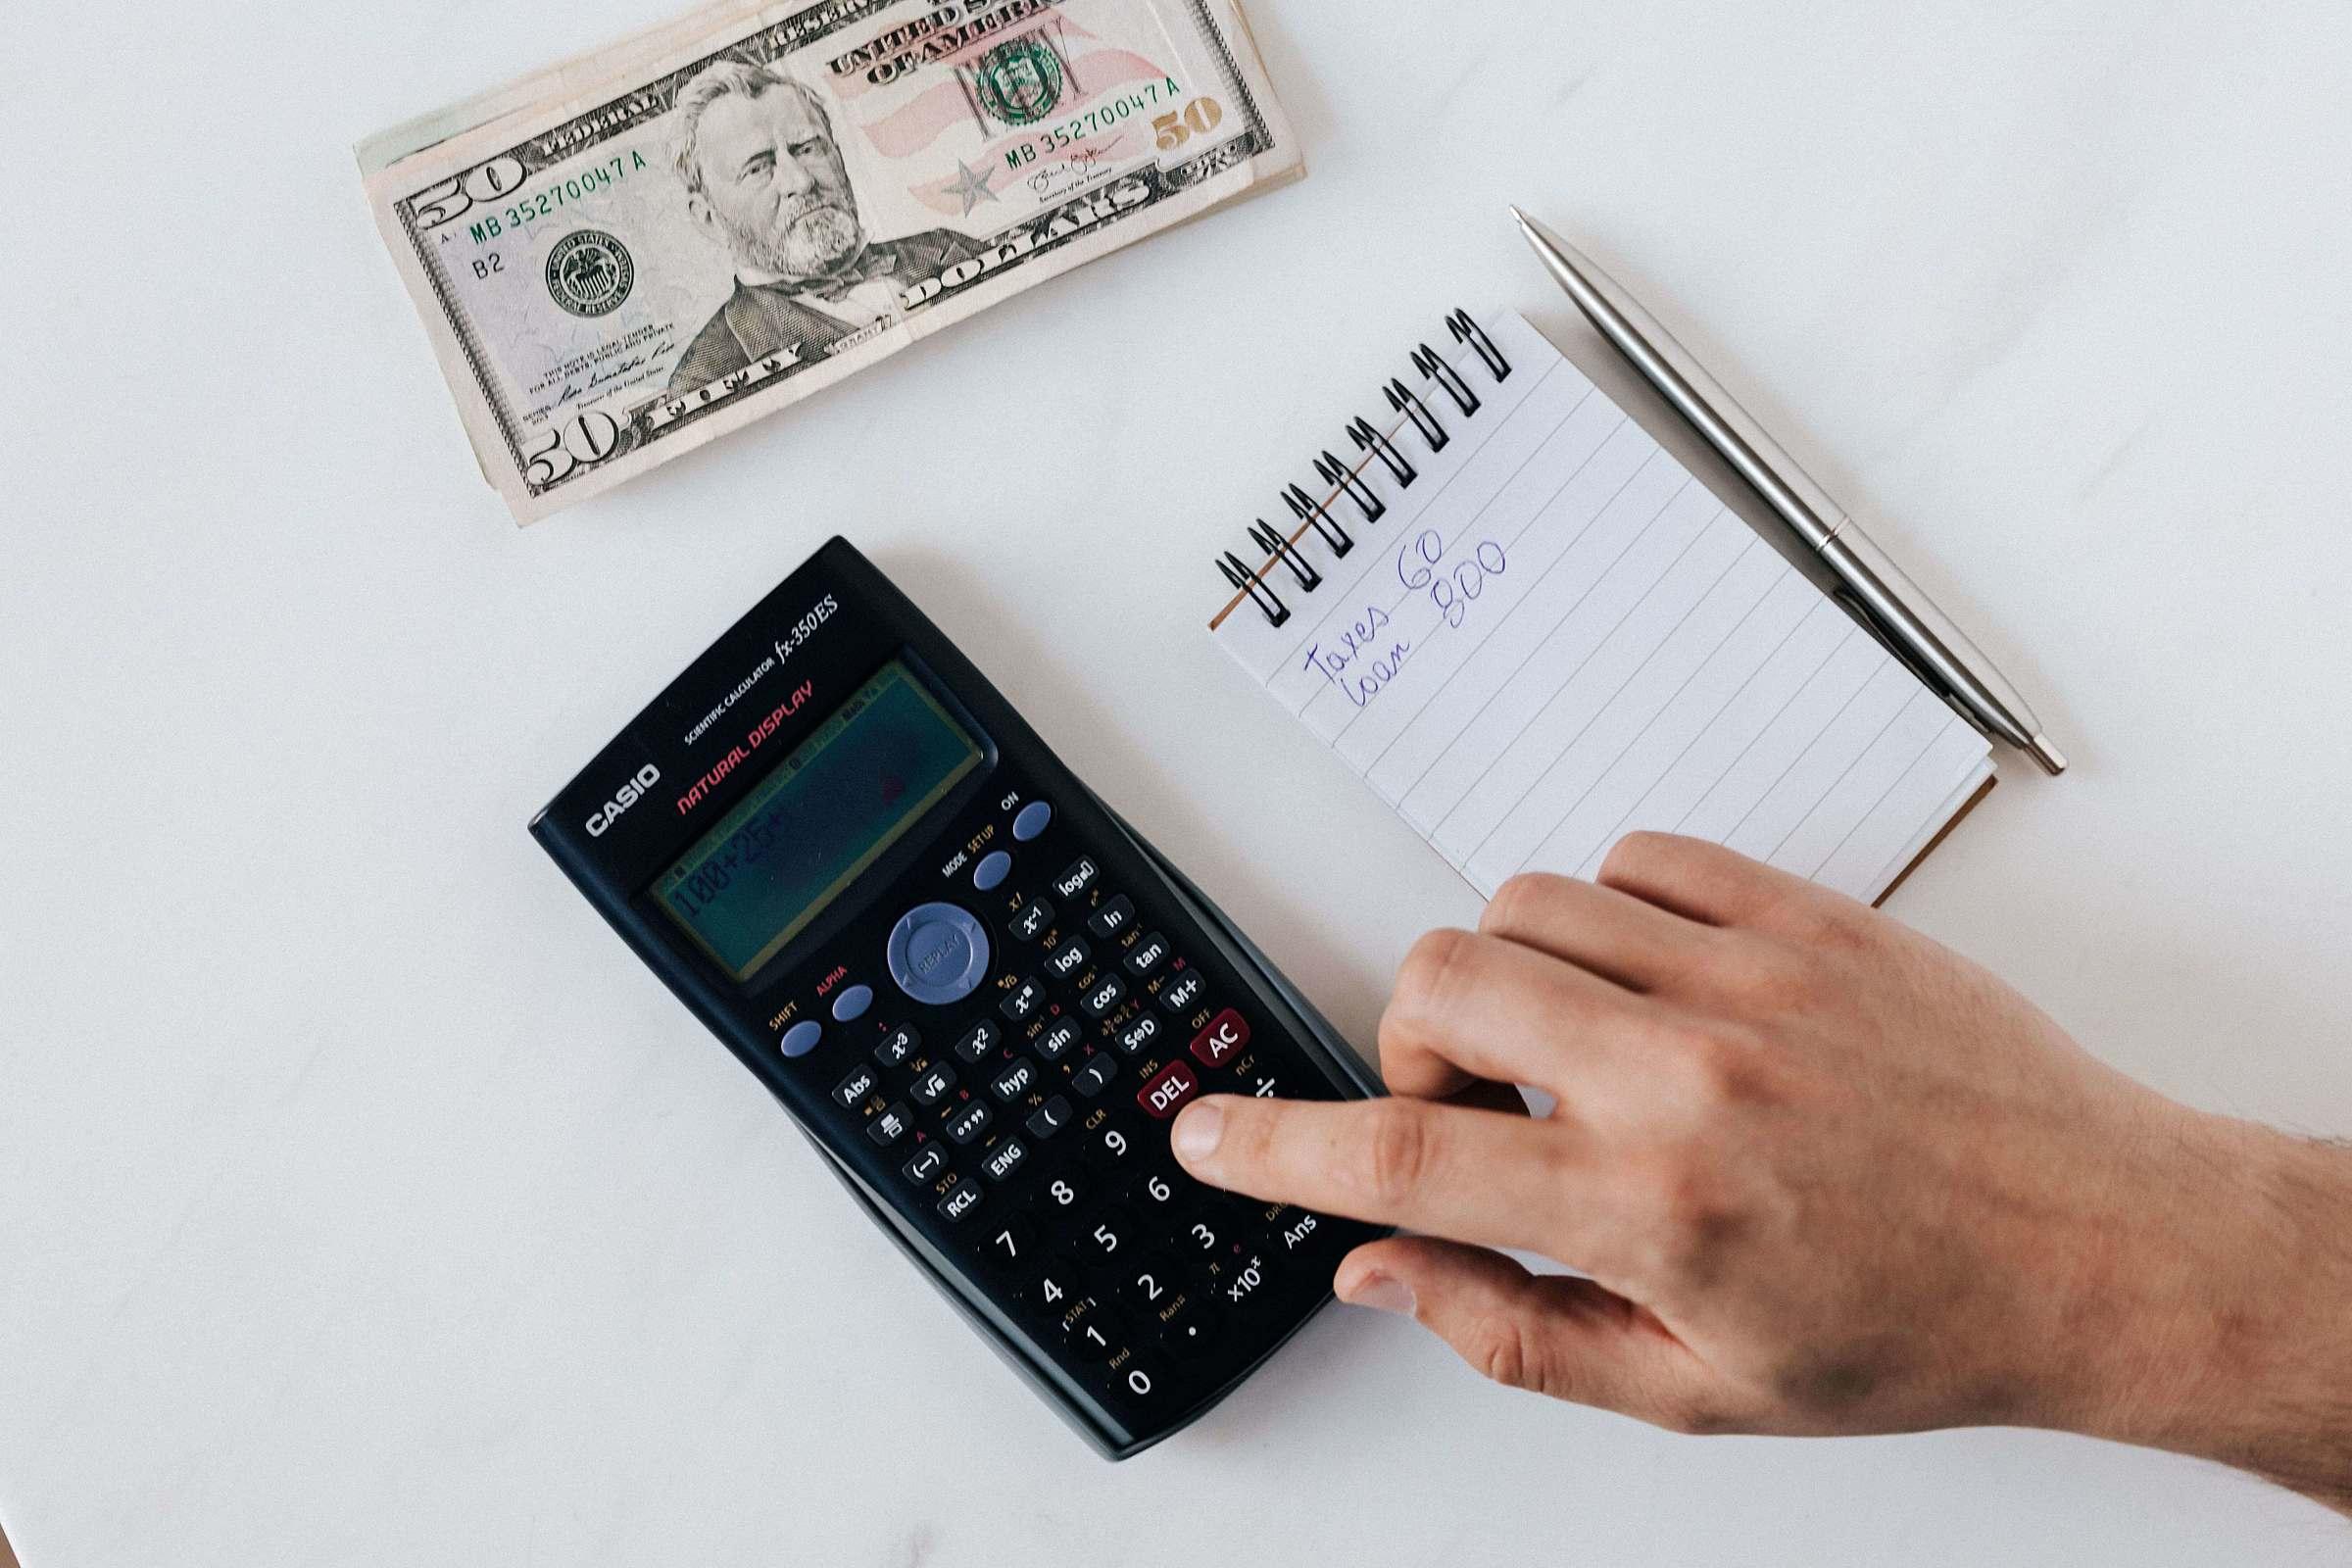 Life Insurance Is It Worth It? - FreeMedicalMCQs.com